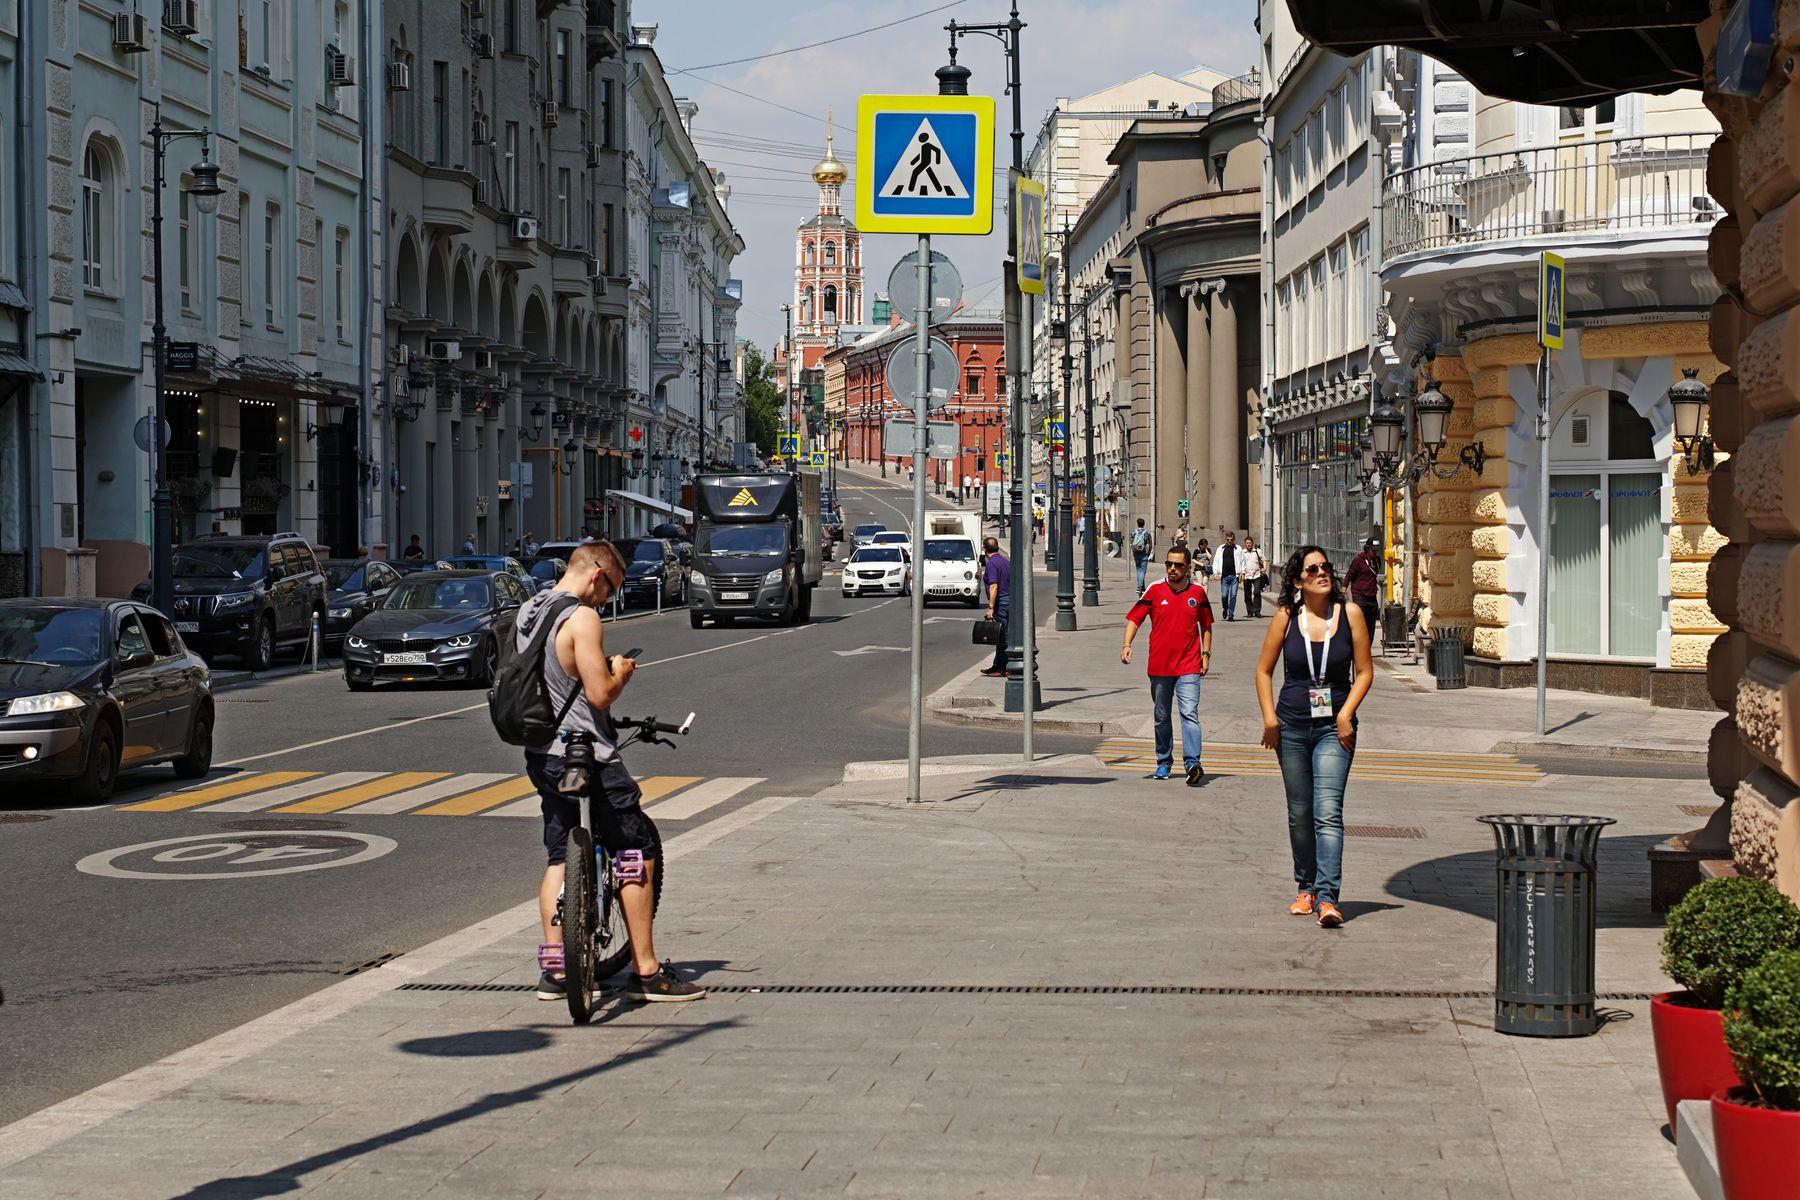 Петровка город Москва улица Петровка